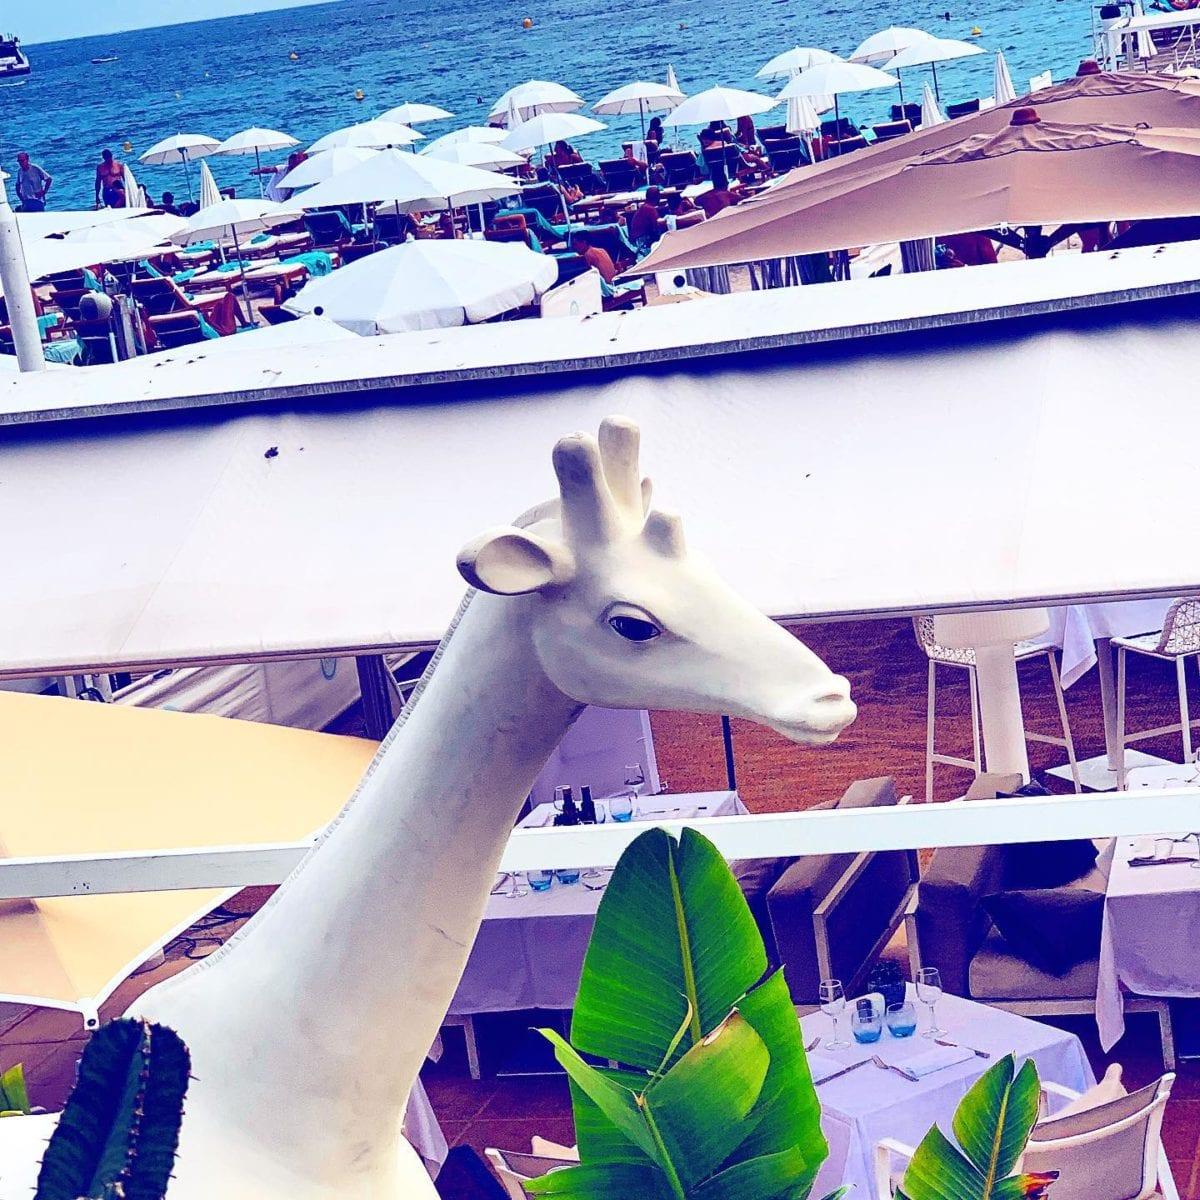 Hommage à @mimi_la_girafe ⛱️ ️